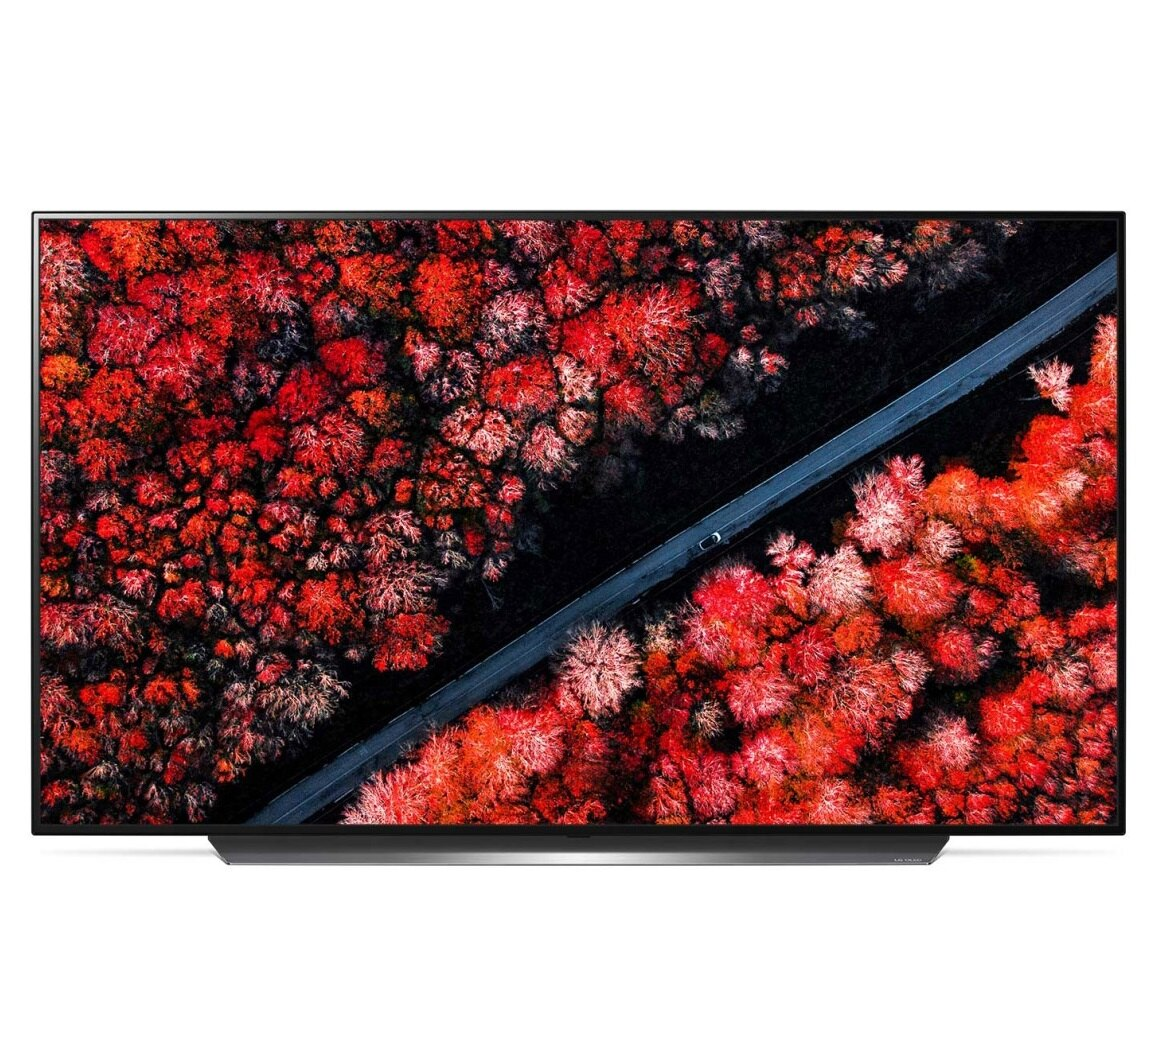 LG 65型OLED 4K智慧物聯網電視OLED 65C9PWA